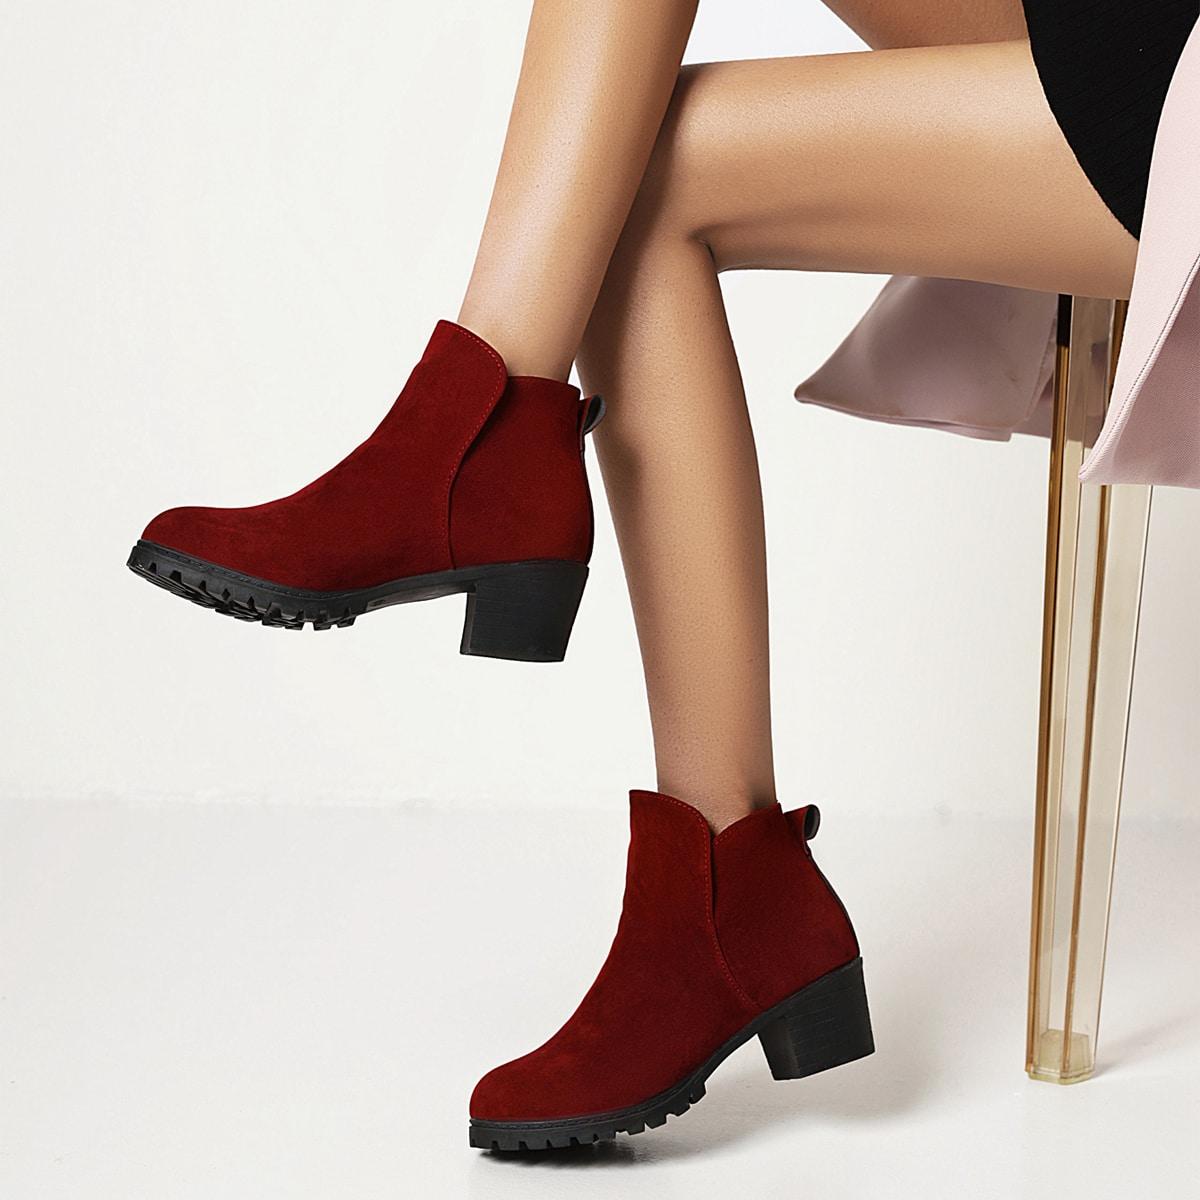 SHEIN Minimalistische dikke hakken laarzen